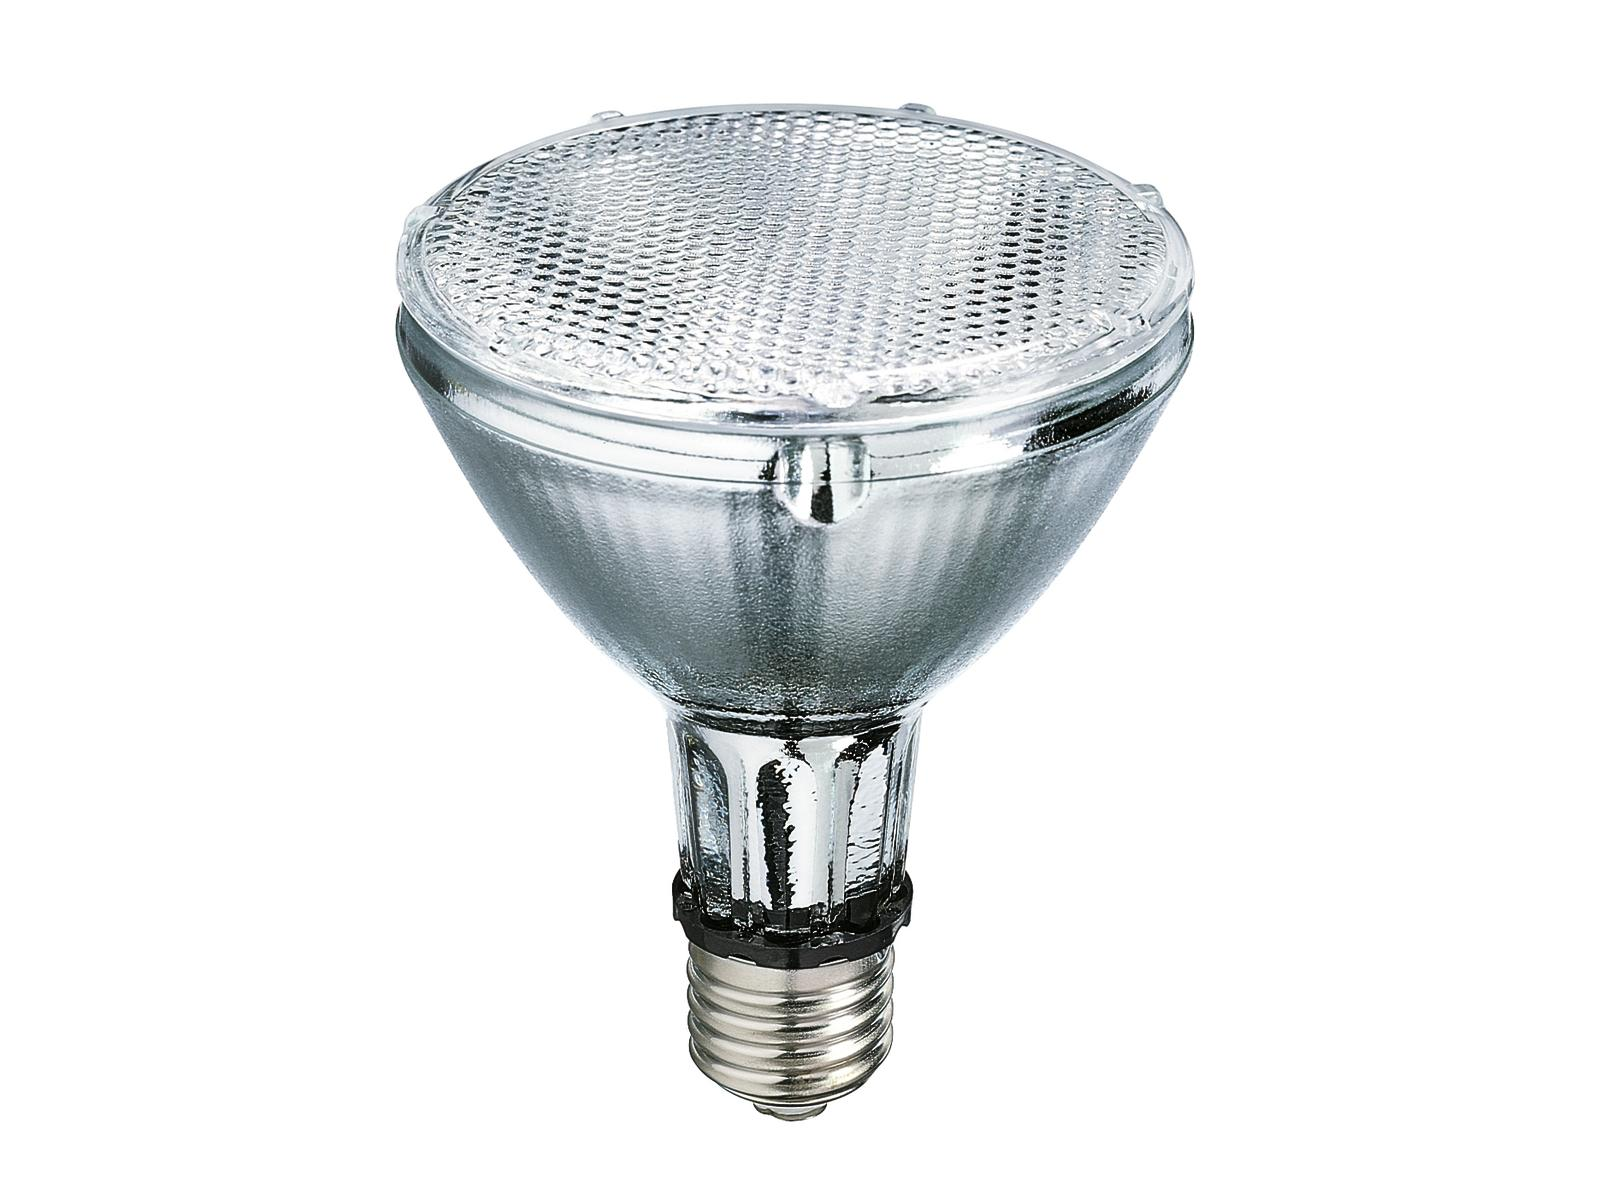 Lamp Headlight Par PHILIPS CDM-R 70W Attack And-27 3000 K